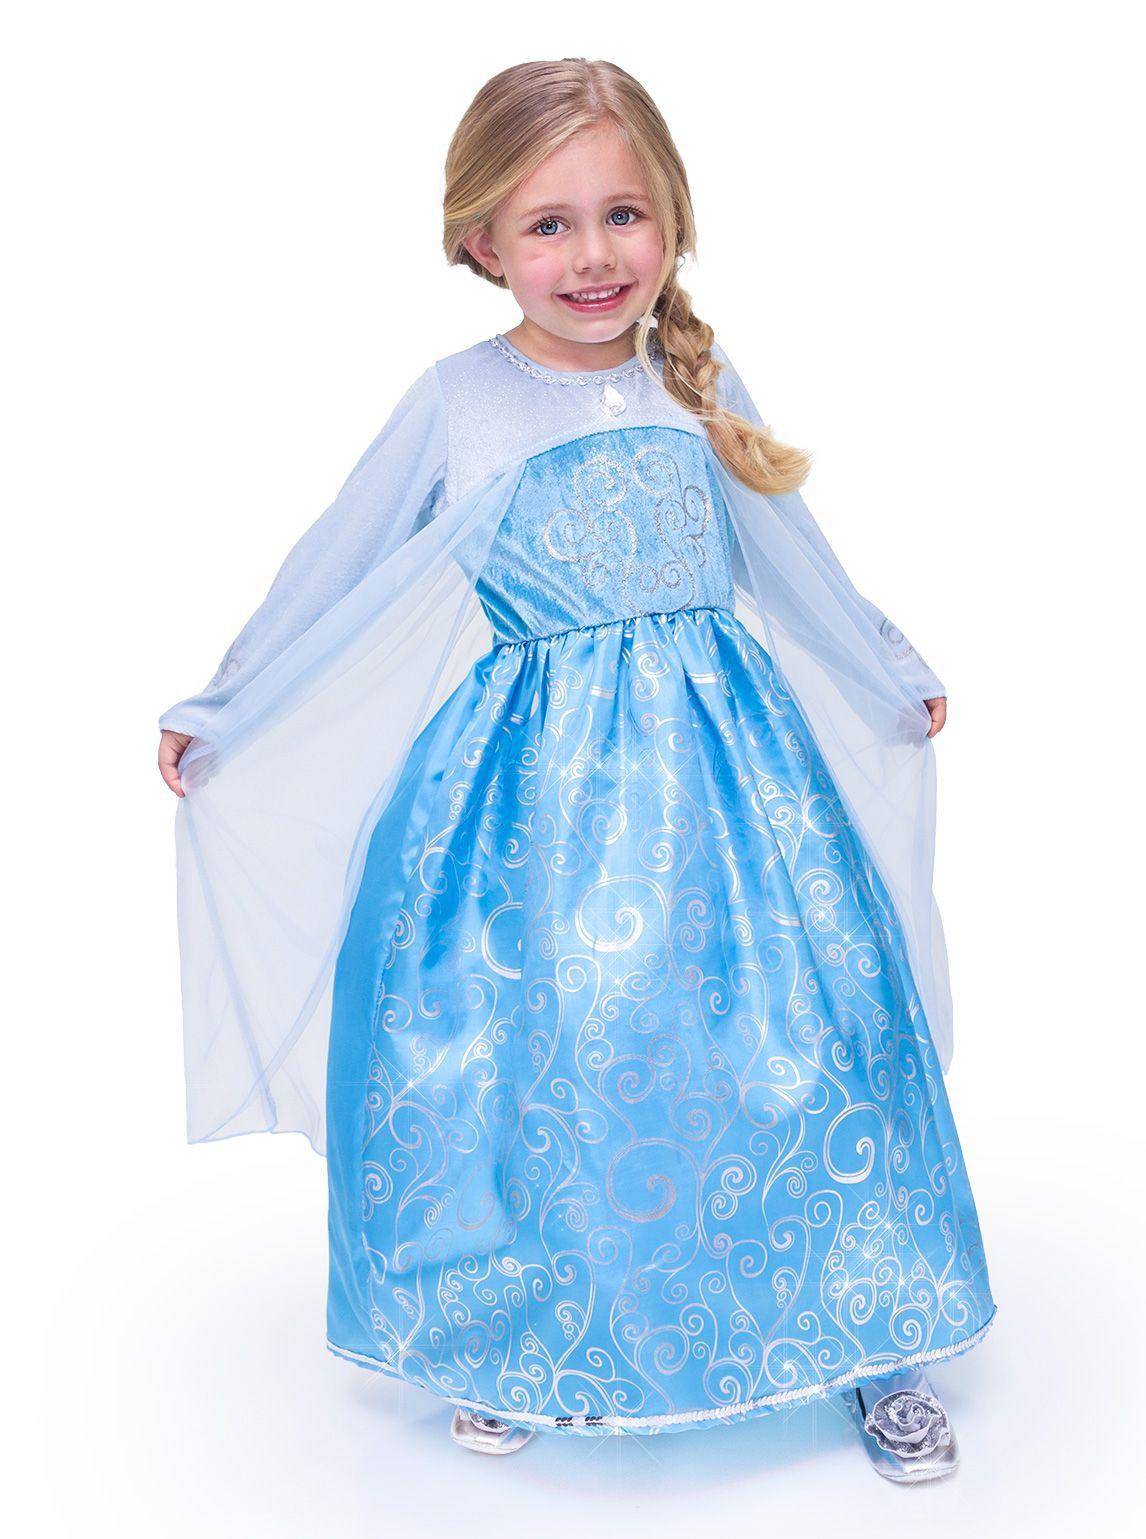 Ice Princess Dress | Frozen Bday Party | Pinterest | Ice princess ...